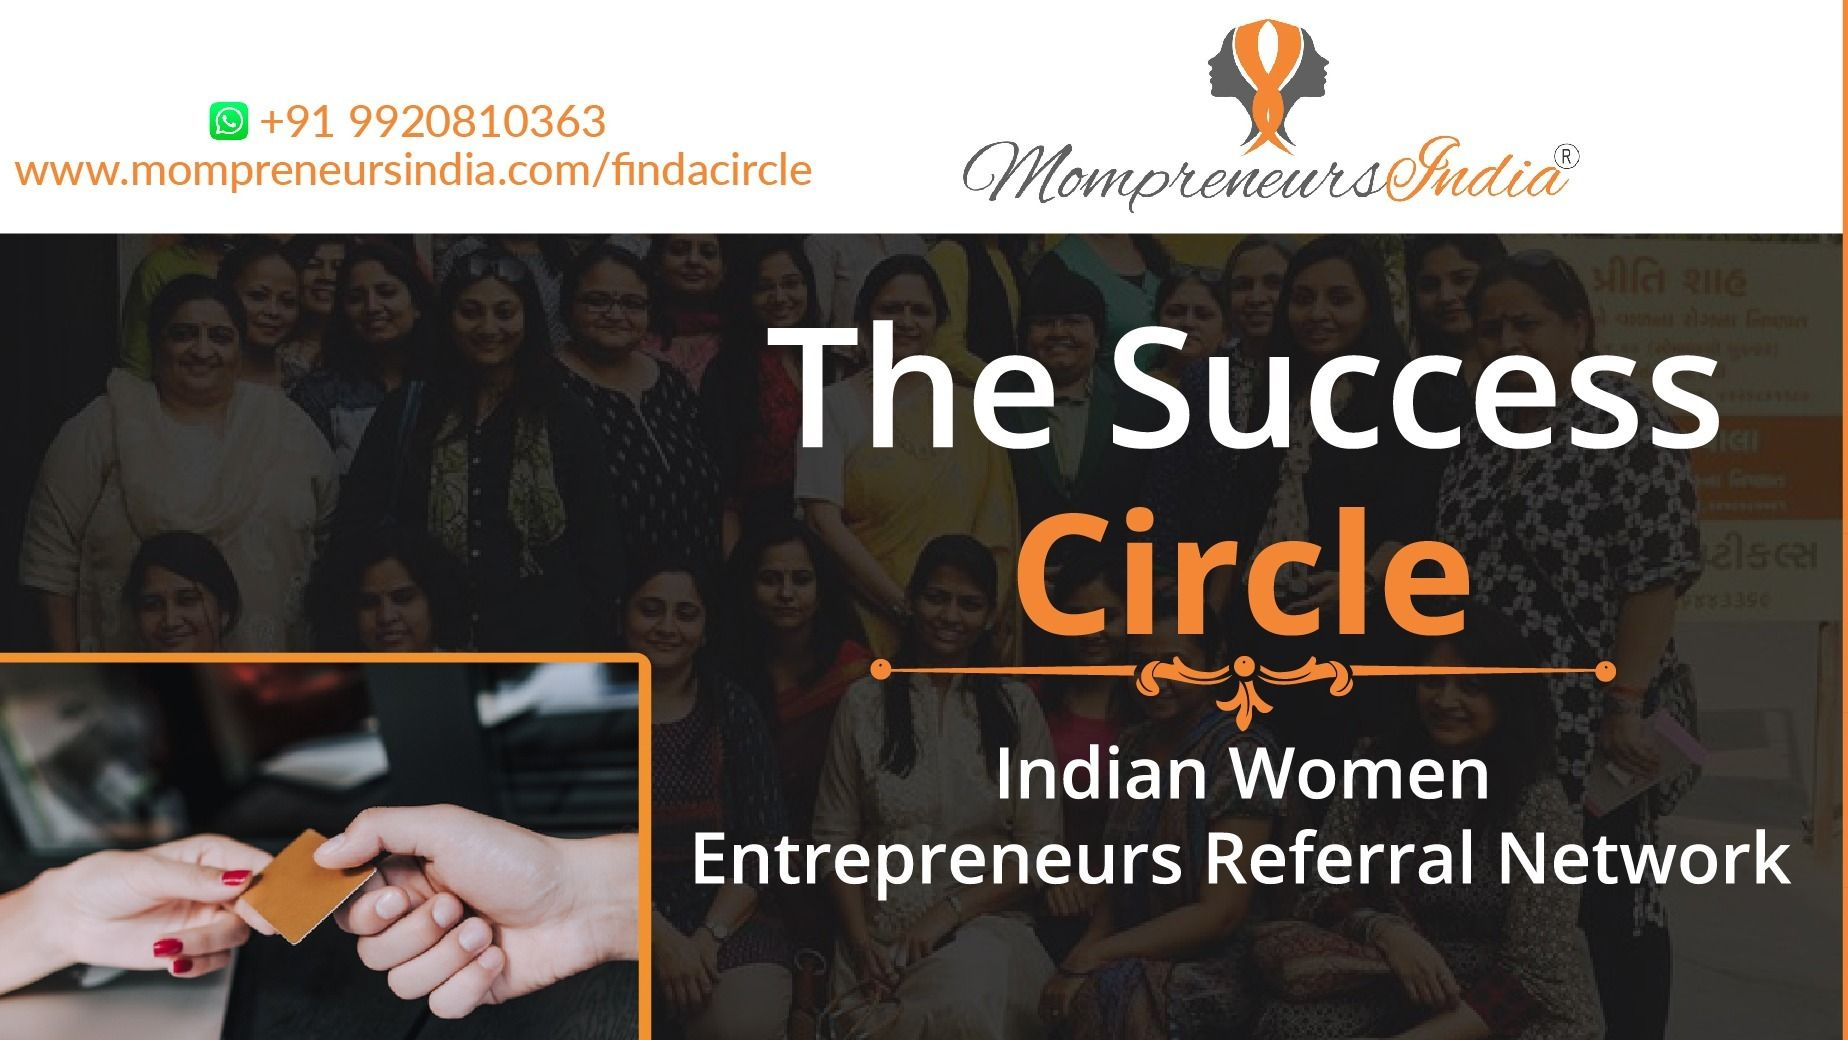 Mumbai Women Entrepreneurs Support & Self Help Group